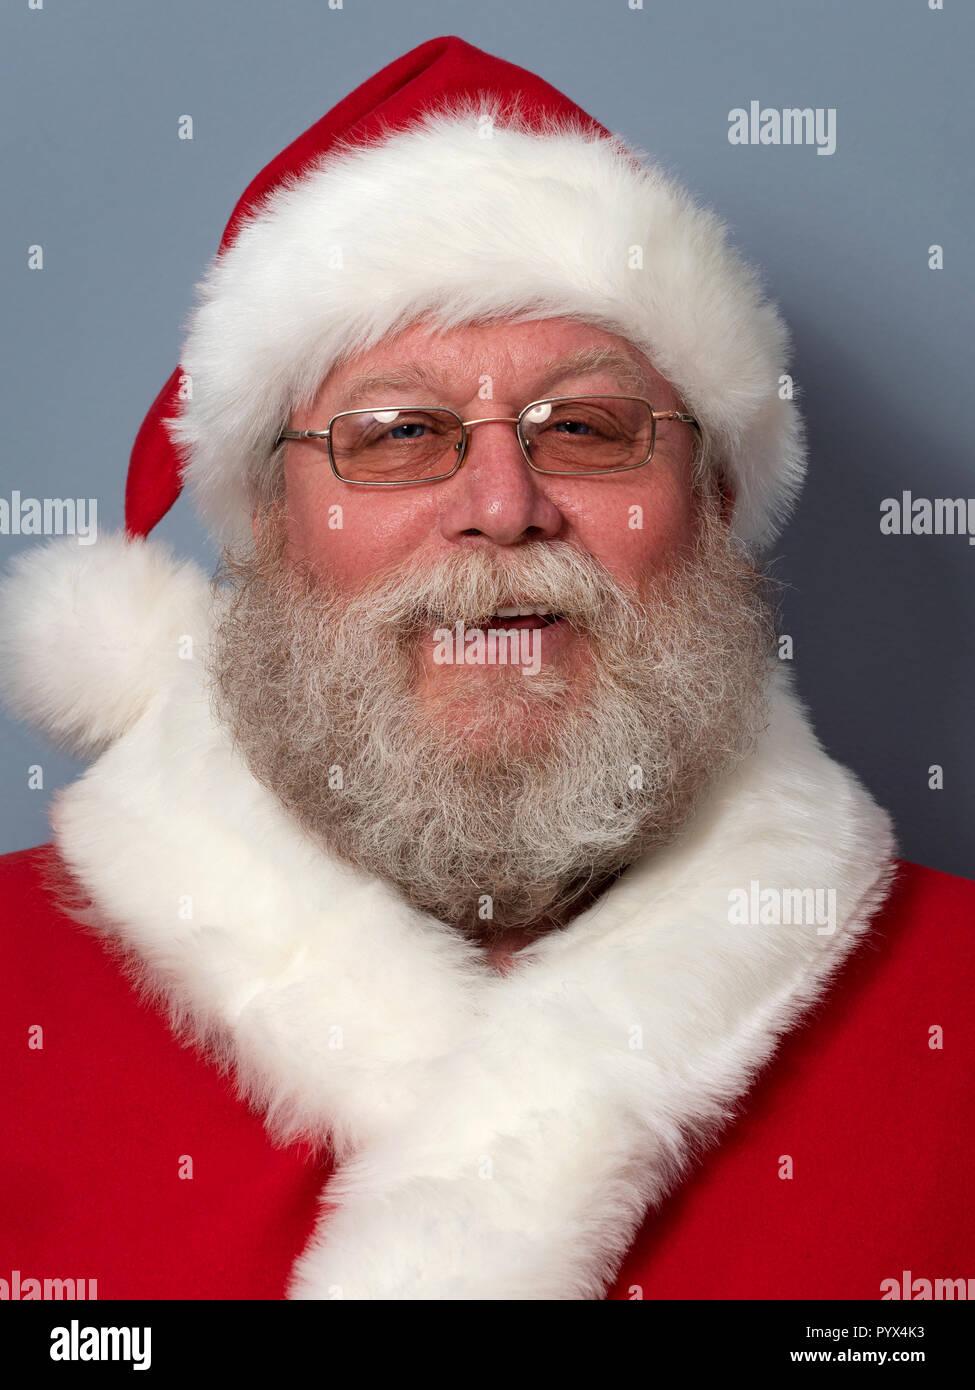 Portrait of happy Santa Claus Stock Photo